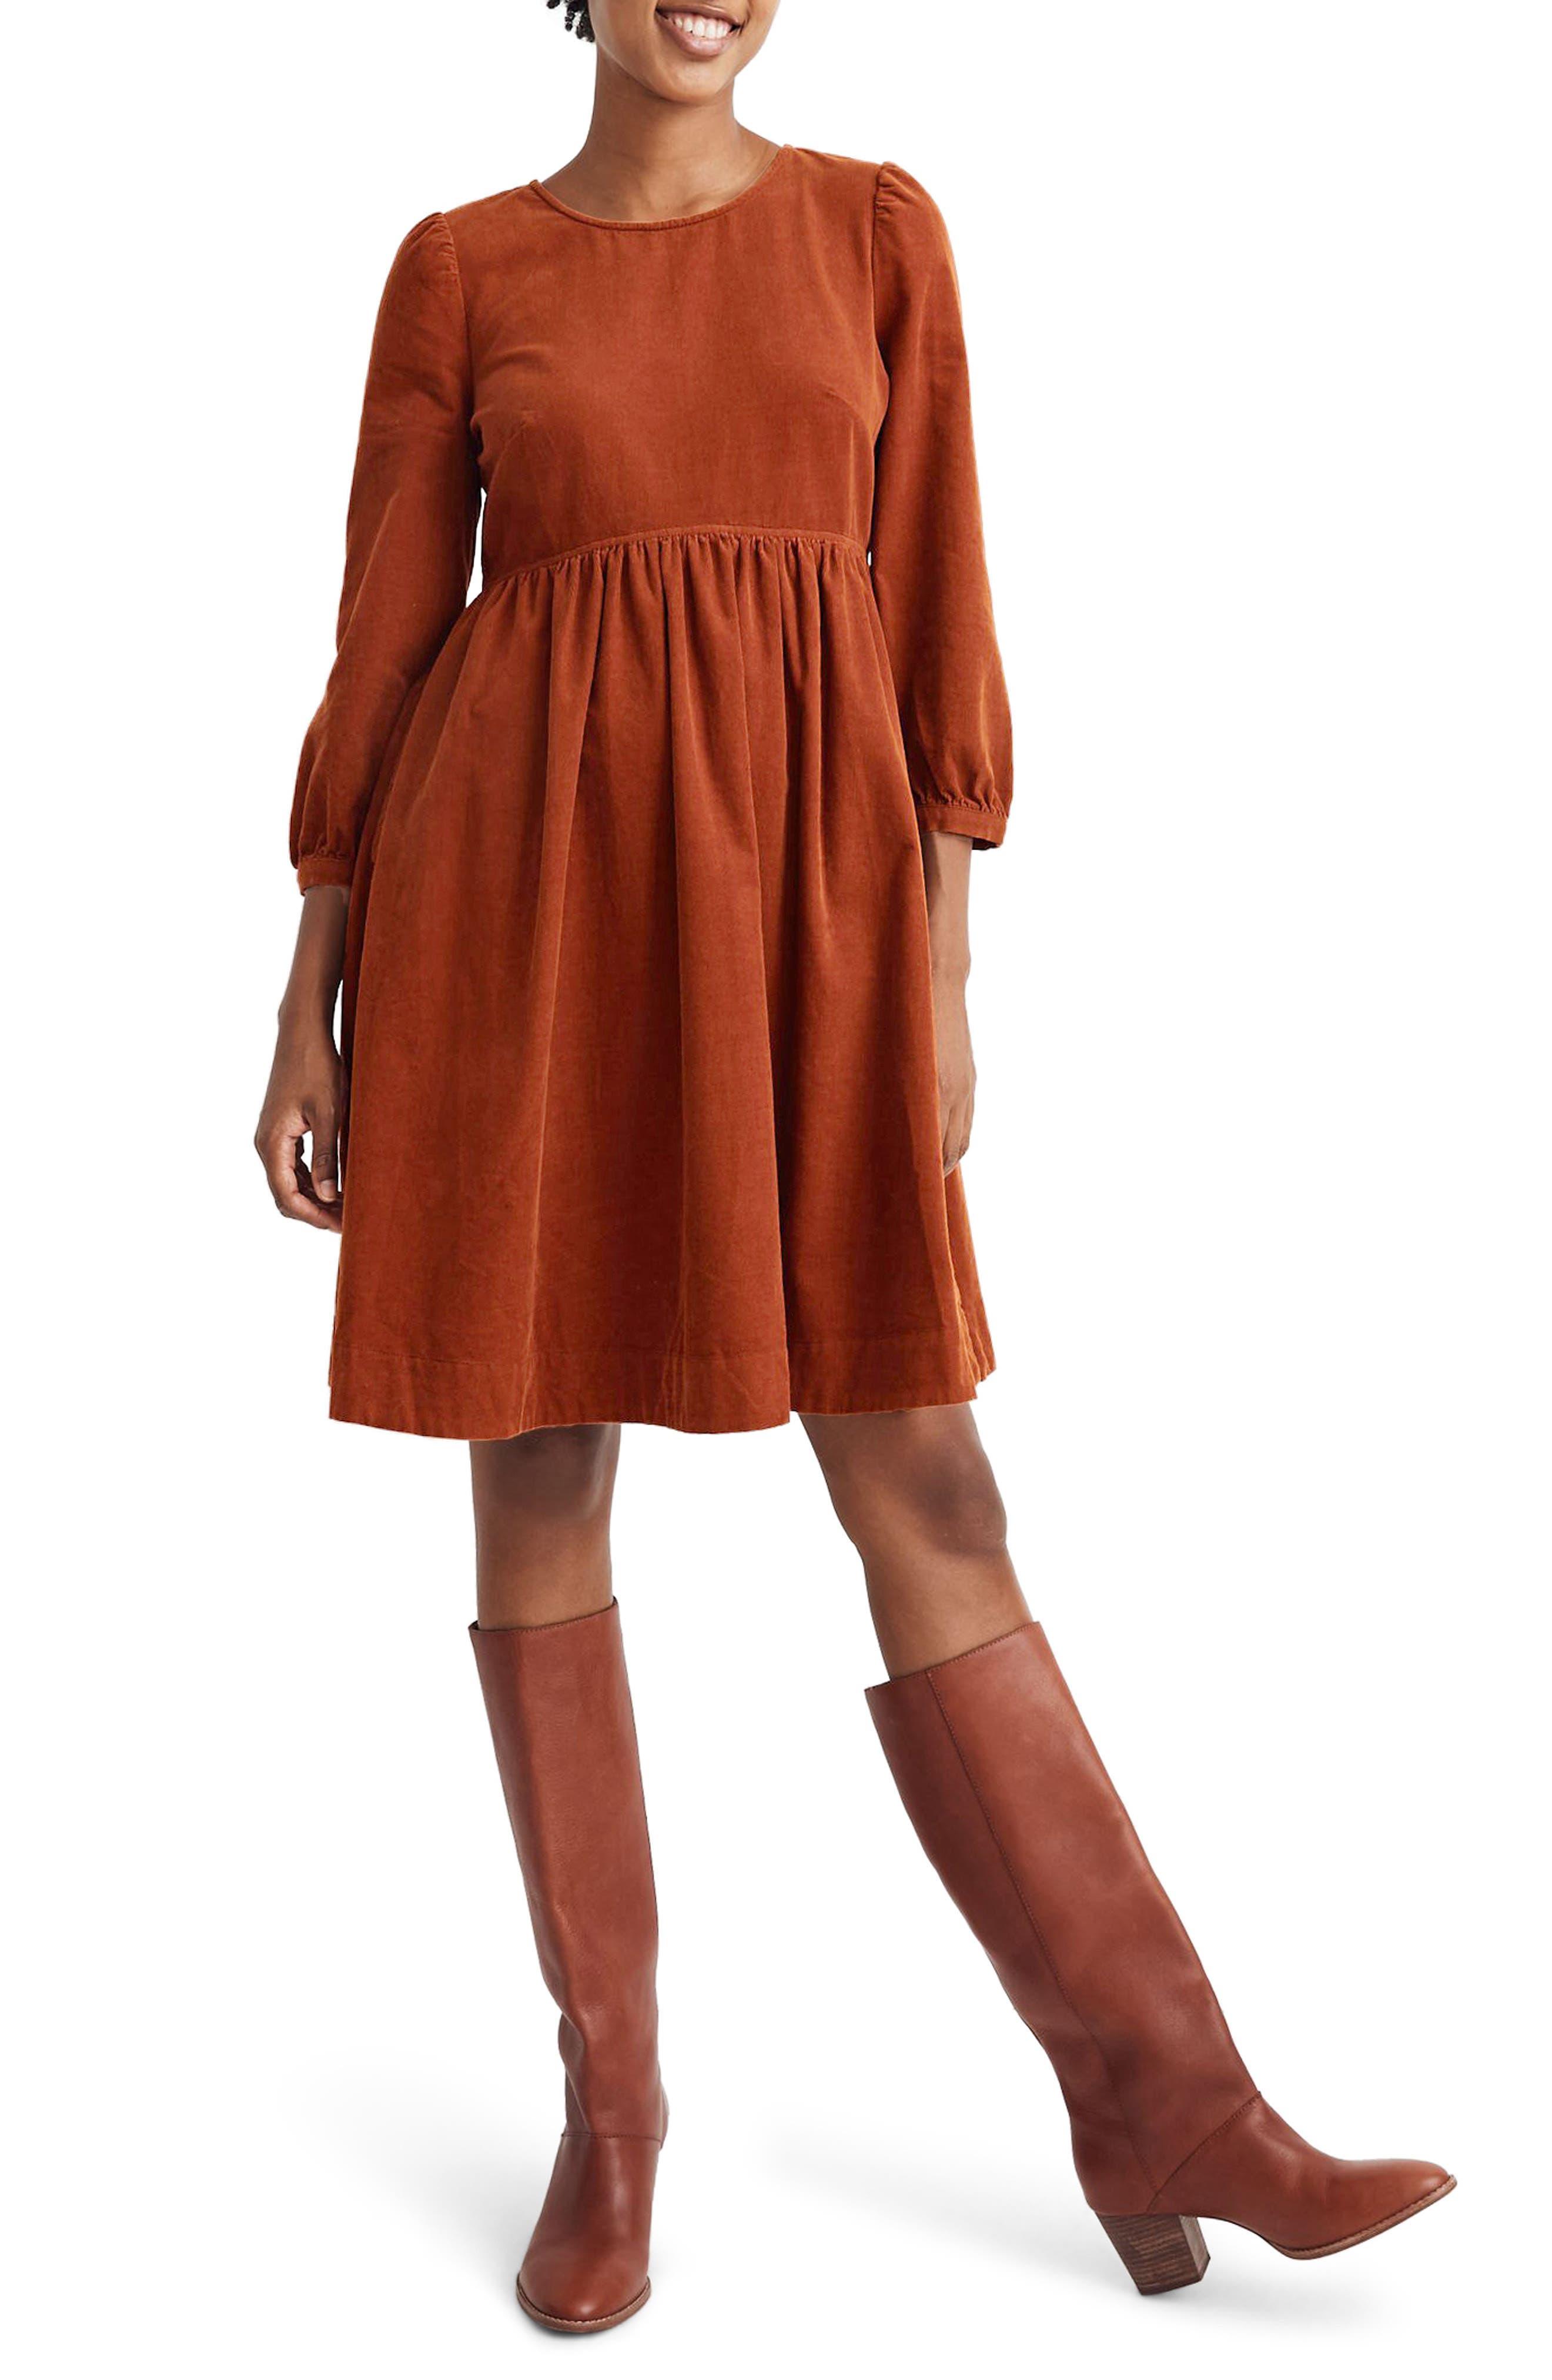 Madewell Corduroy Puff Sleeve Minidress